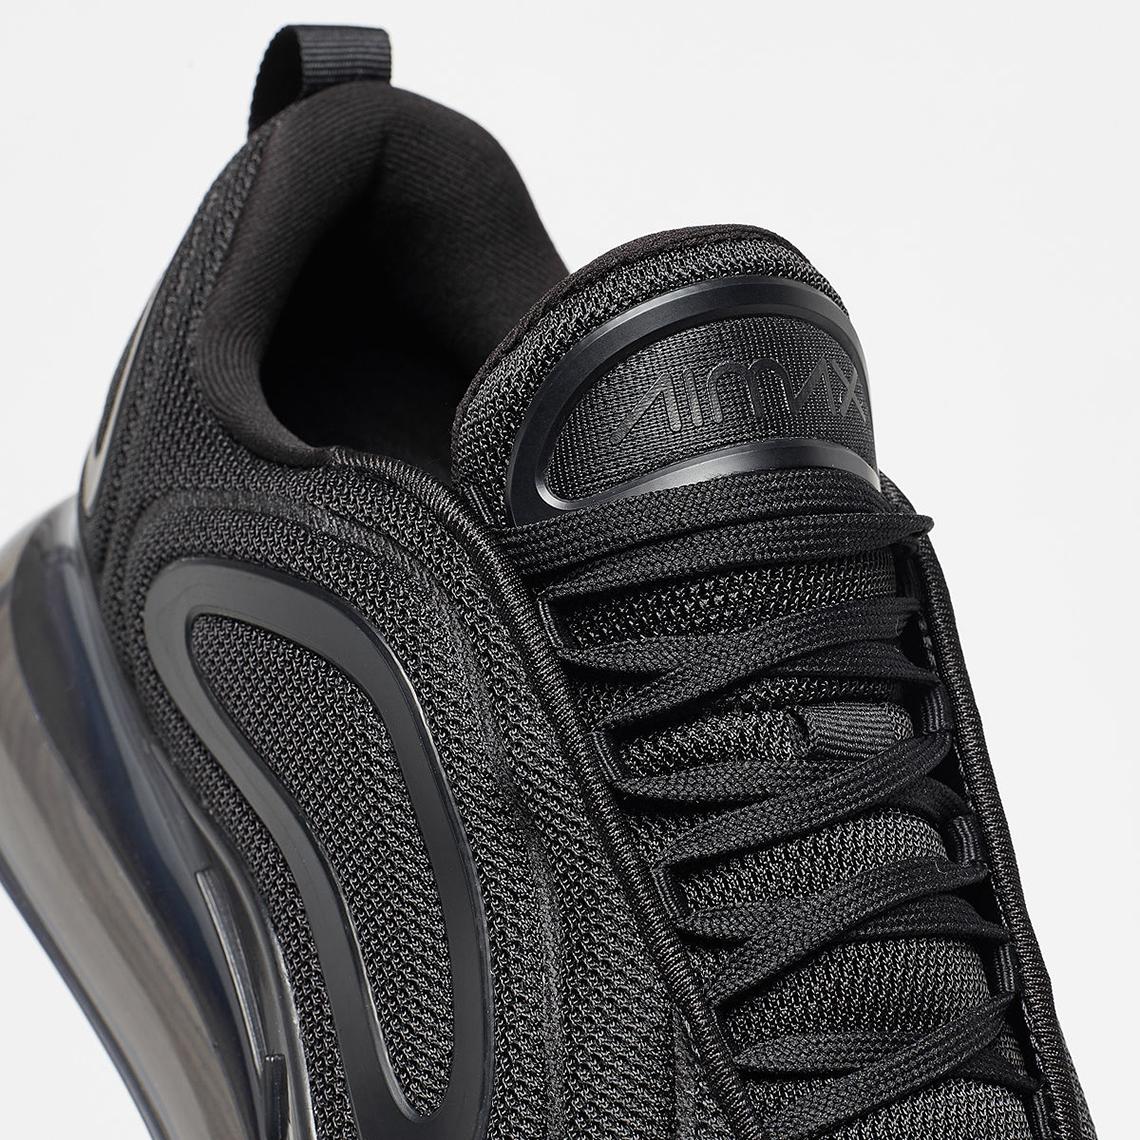 bc7b3aeae7c3 Nike Air Max 720 Black Mesh AO2924-007 Release Date